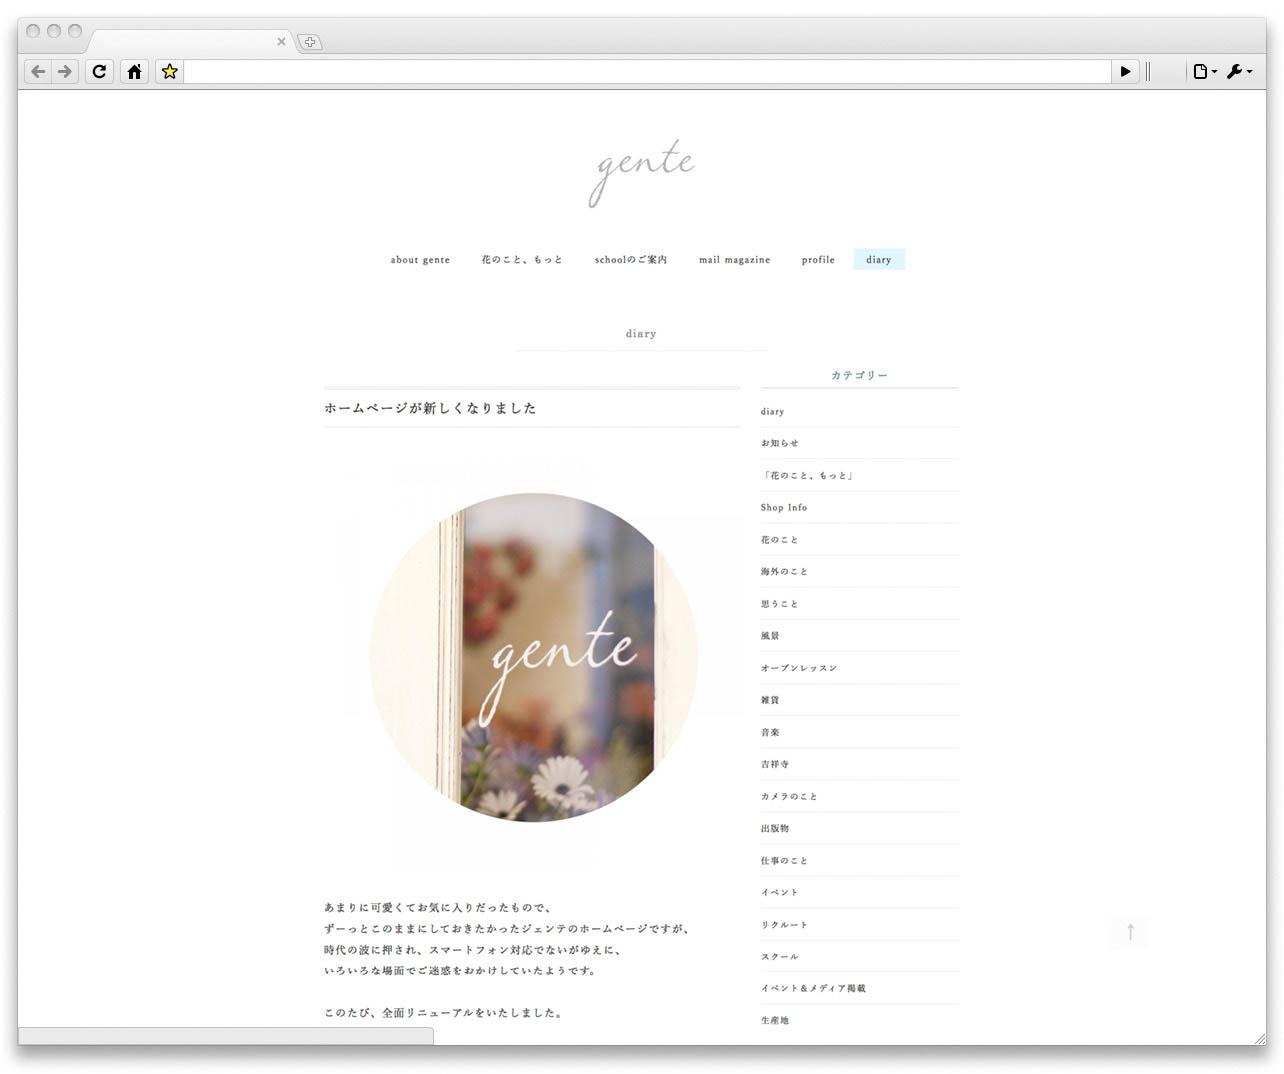 gente webデザイン ブログ